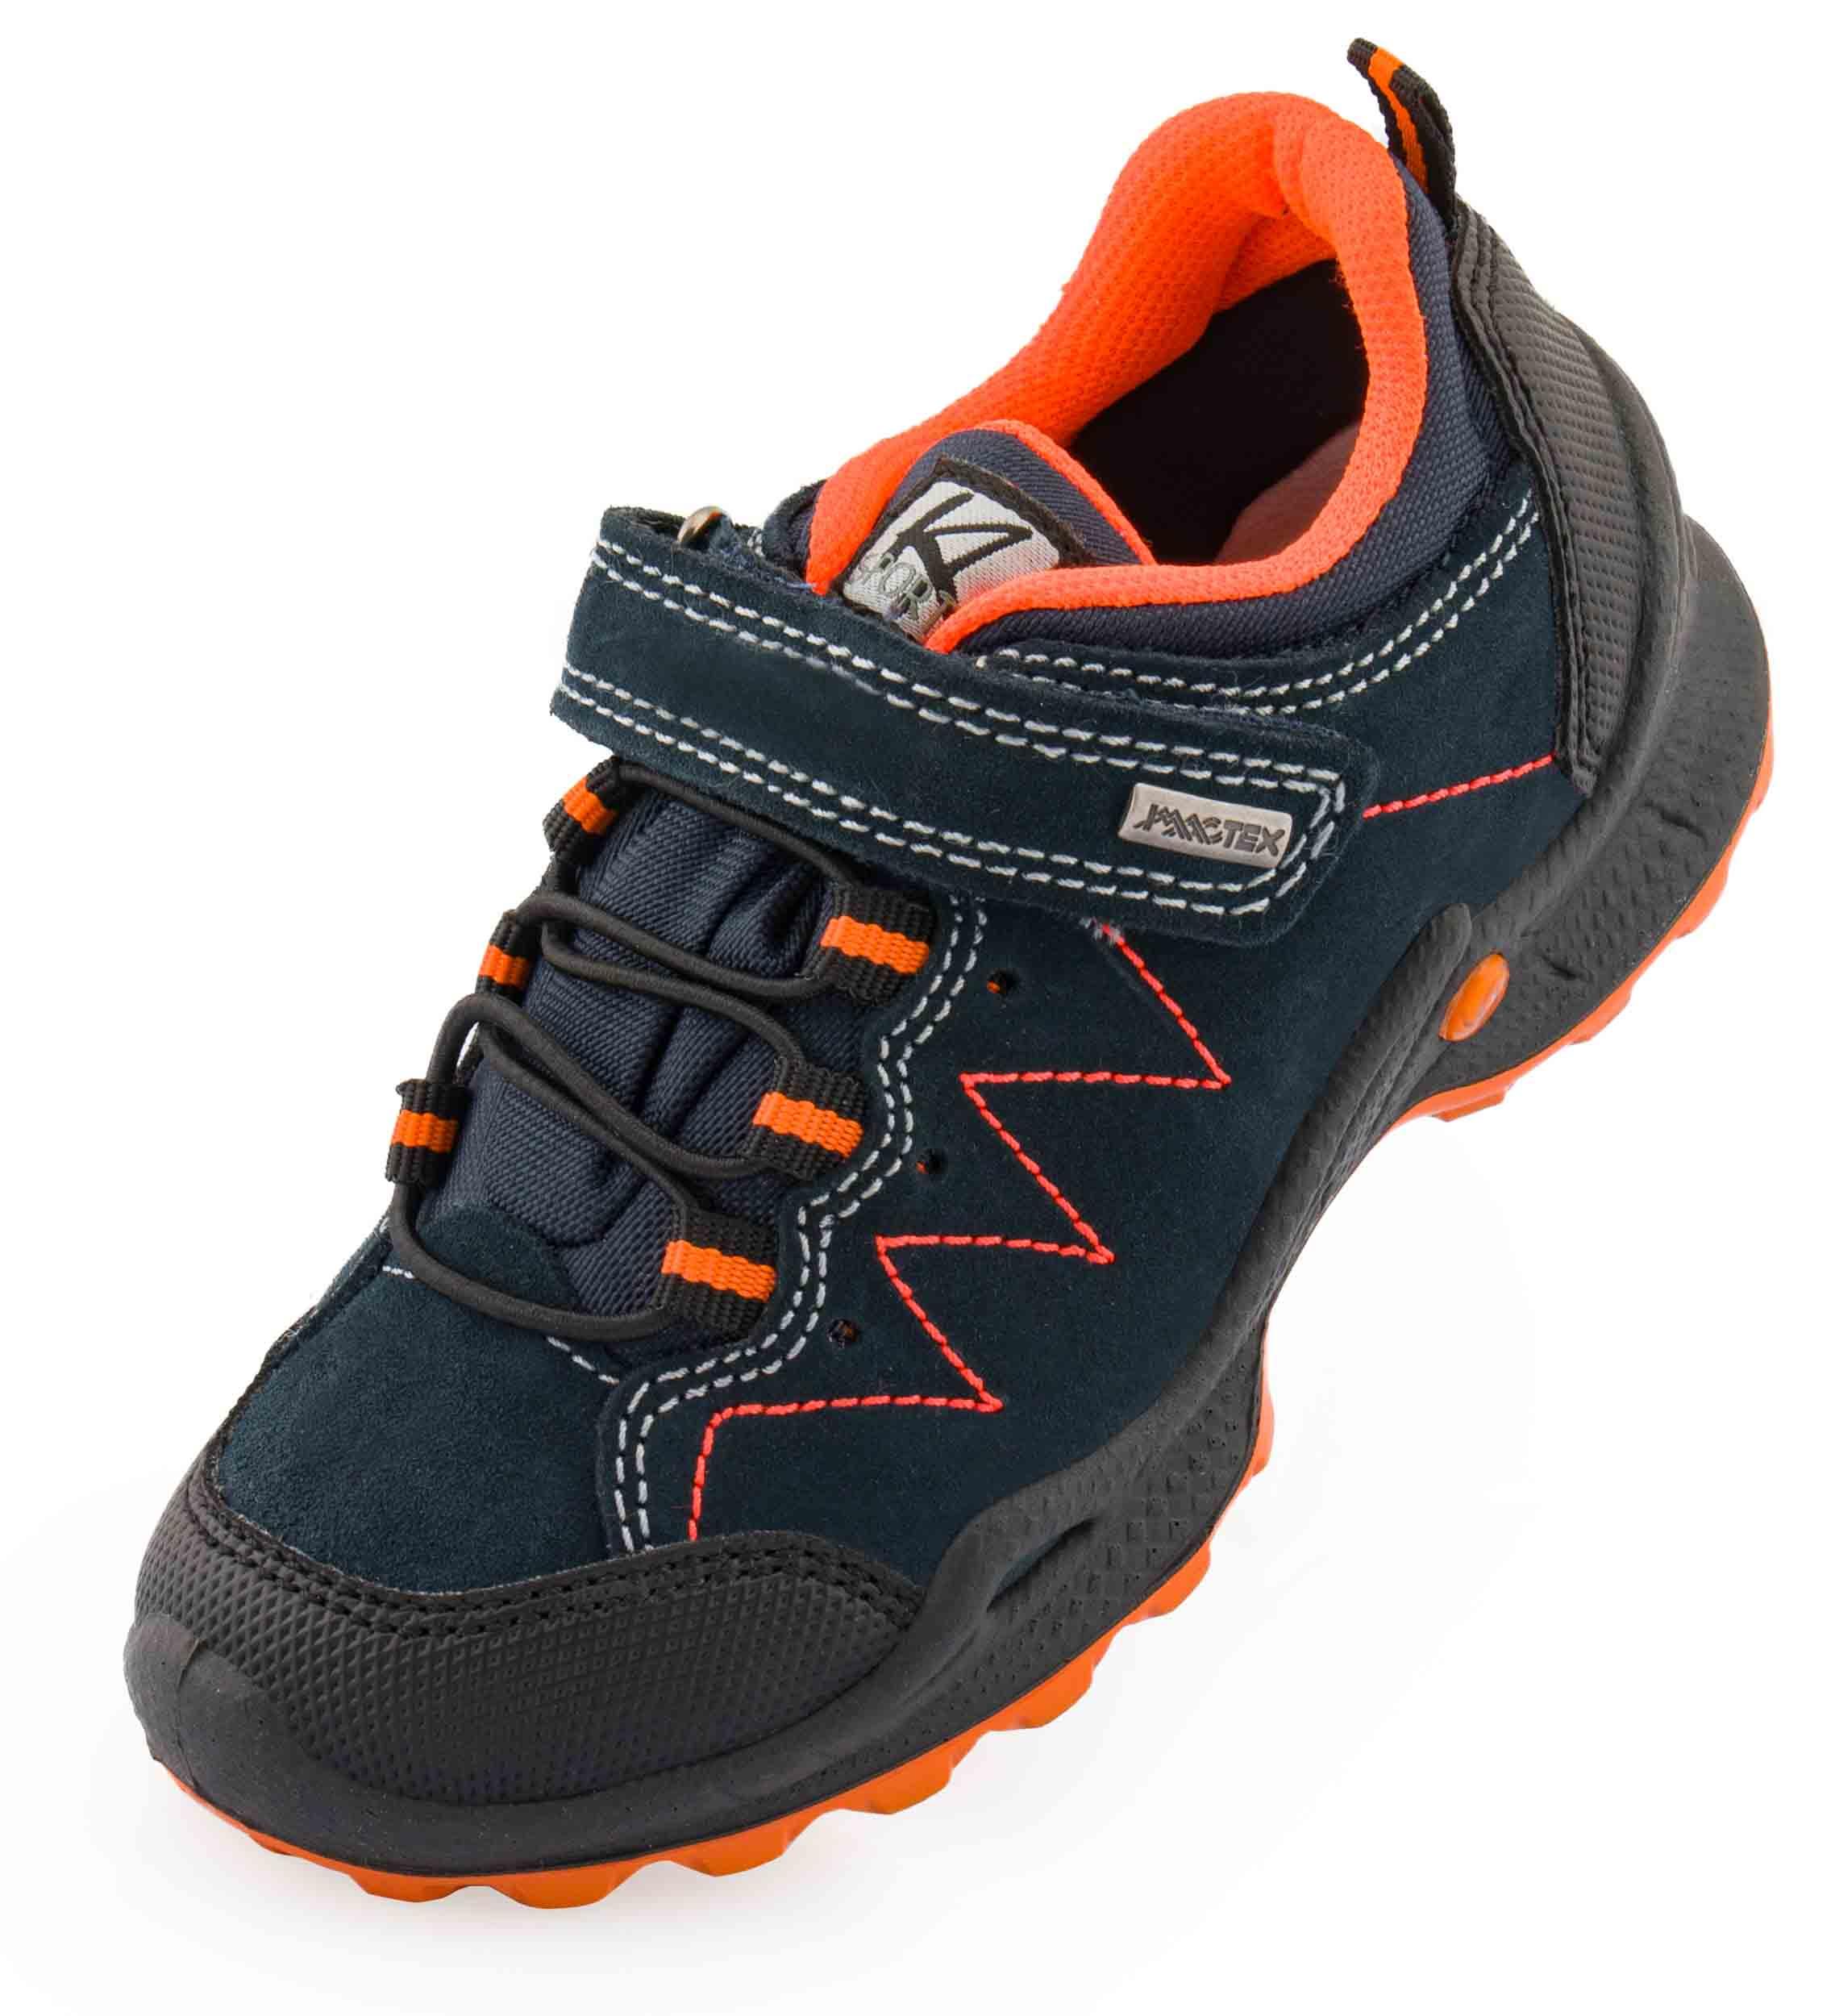 Outdoorová obuv IMAC blue-orange